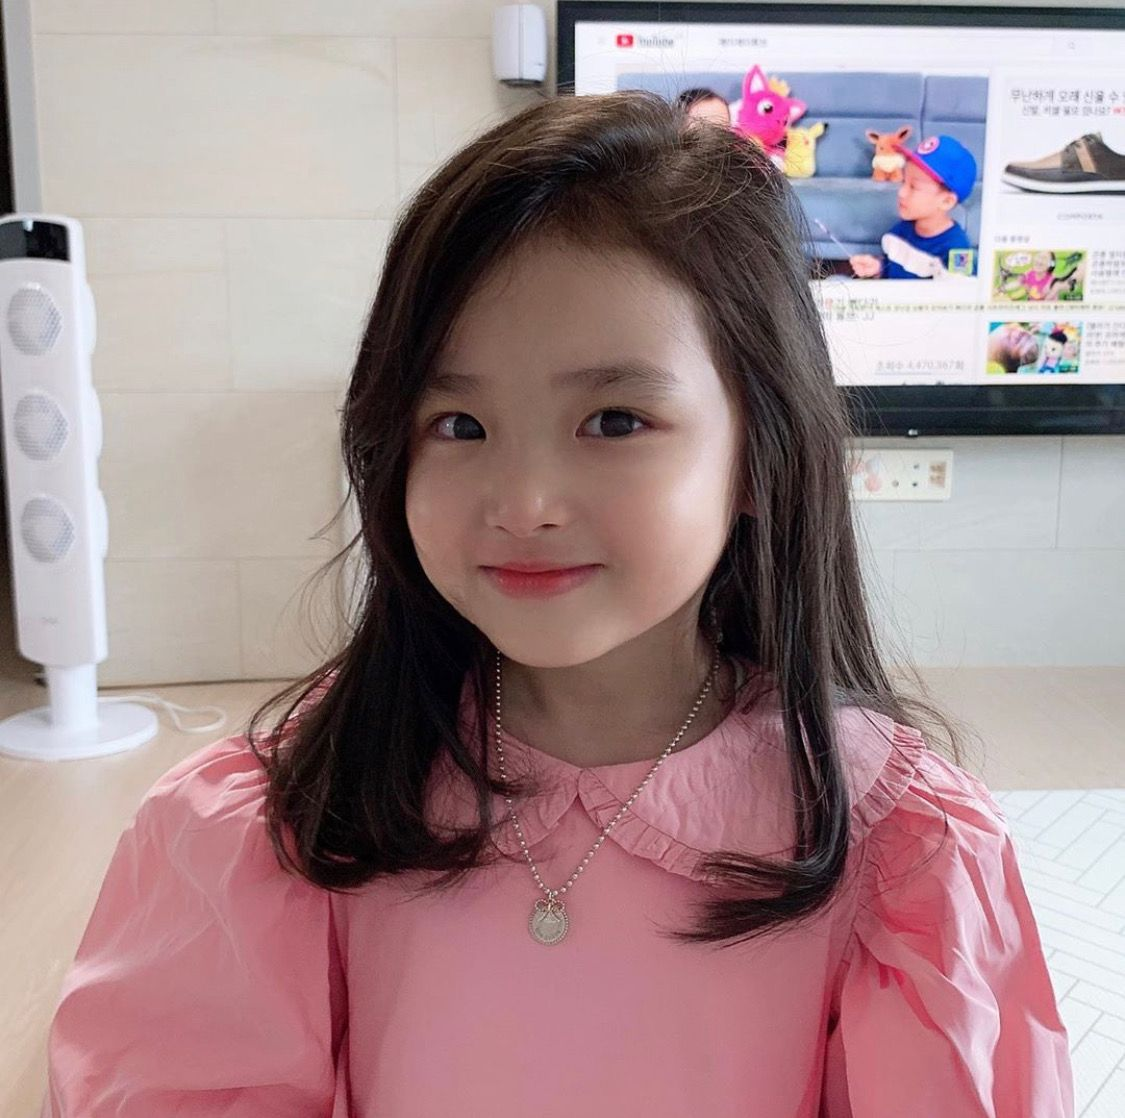 nc.a on Tumblr | Kpop, Korean girl, Singer